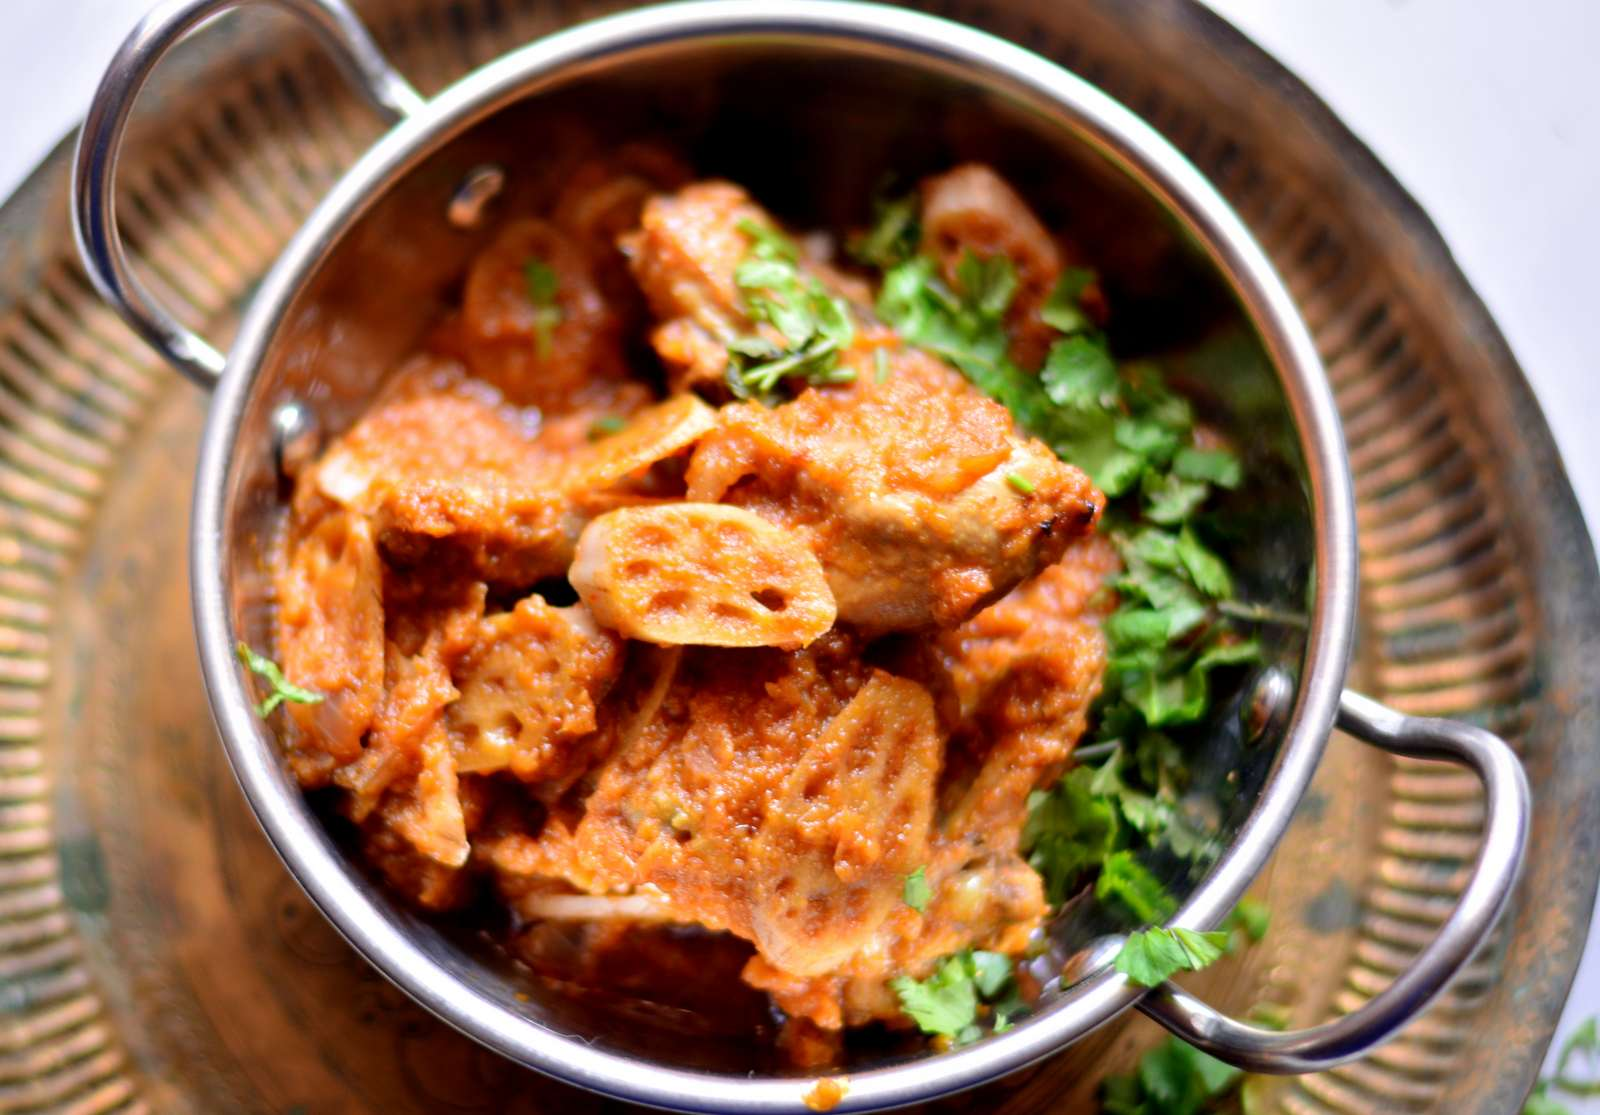 Kashmiri kokur t nadir recipe chicken and lotus stem curry by kashmiri kokur t nadir recipe chicken and lotus stem curry forumfinder Gallery